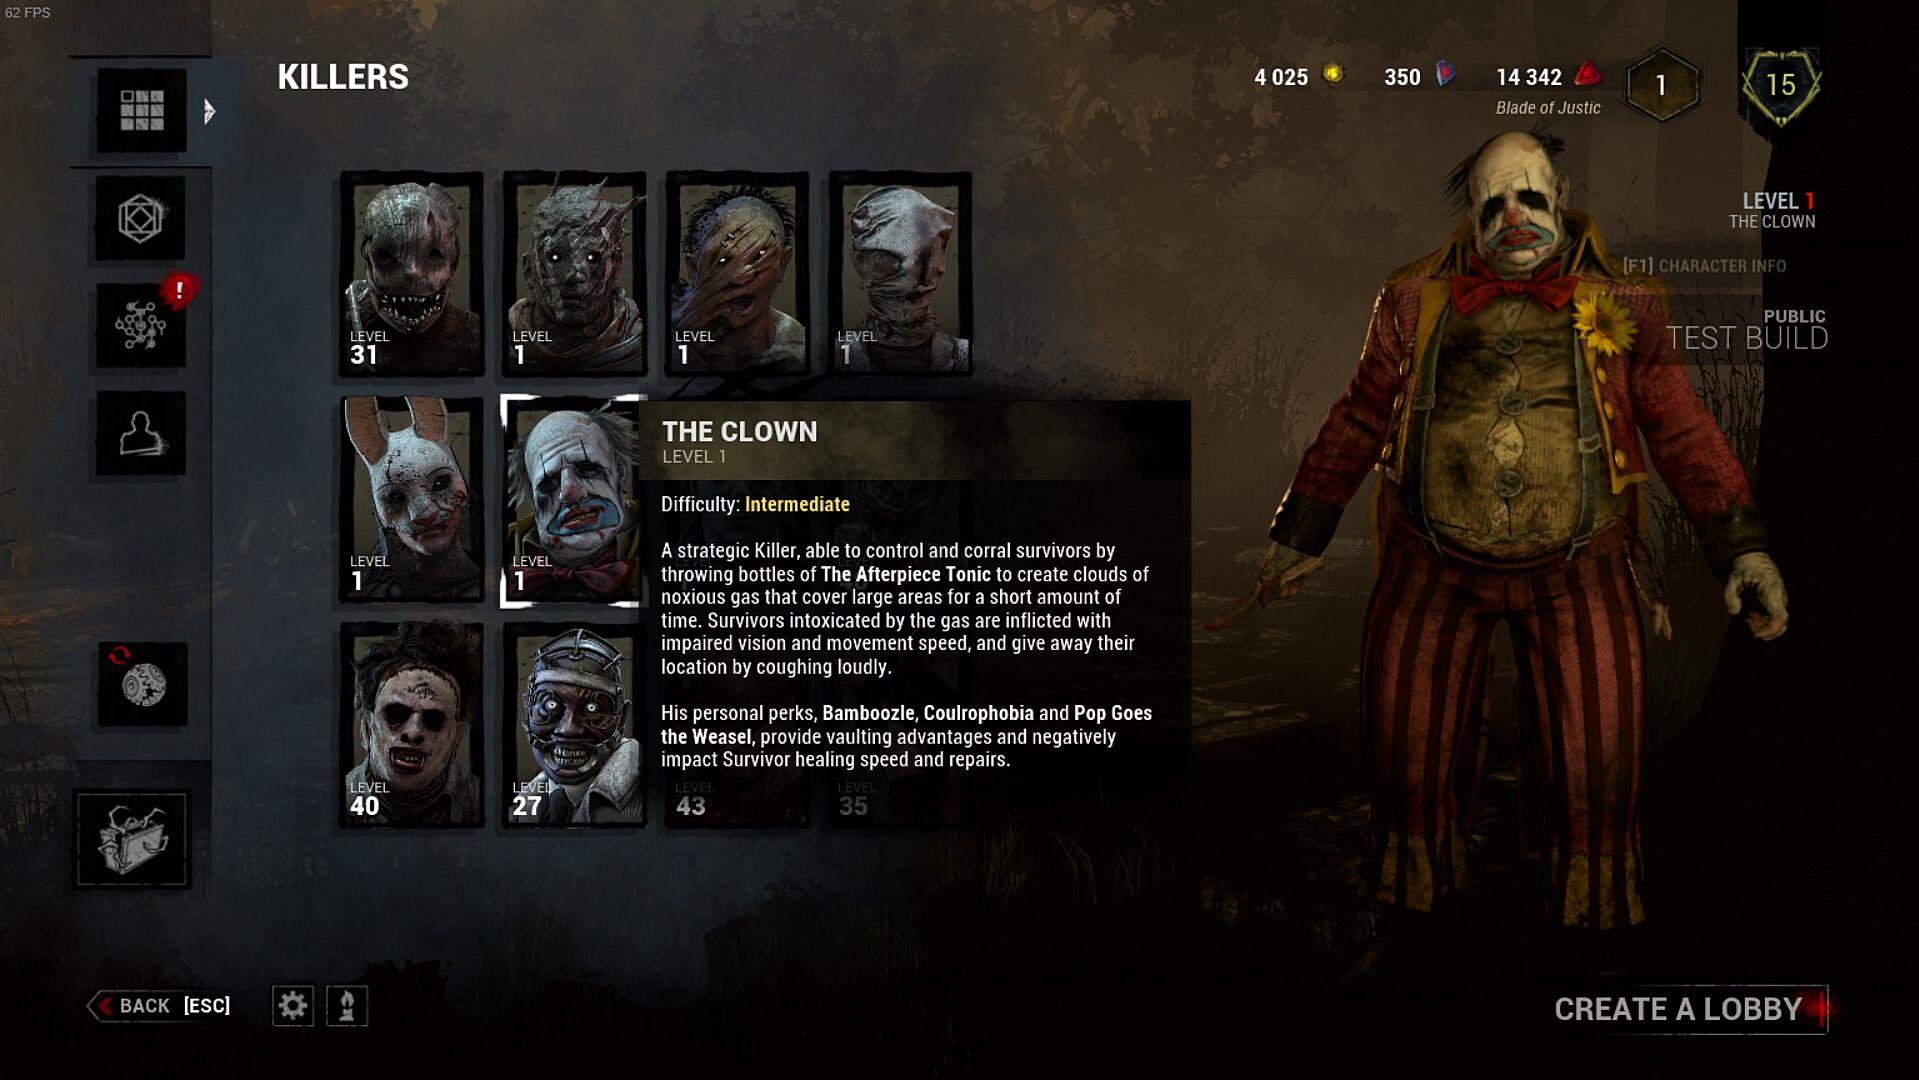 Dead by Daylight reveals creepy new killer clown and survivor